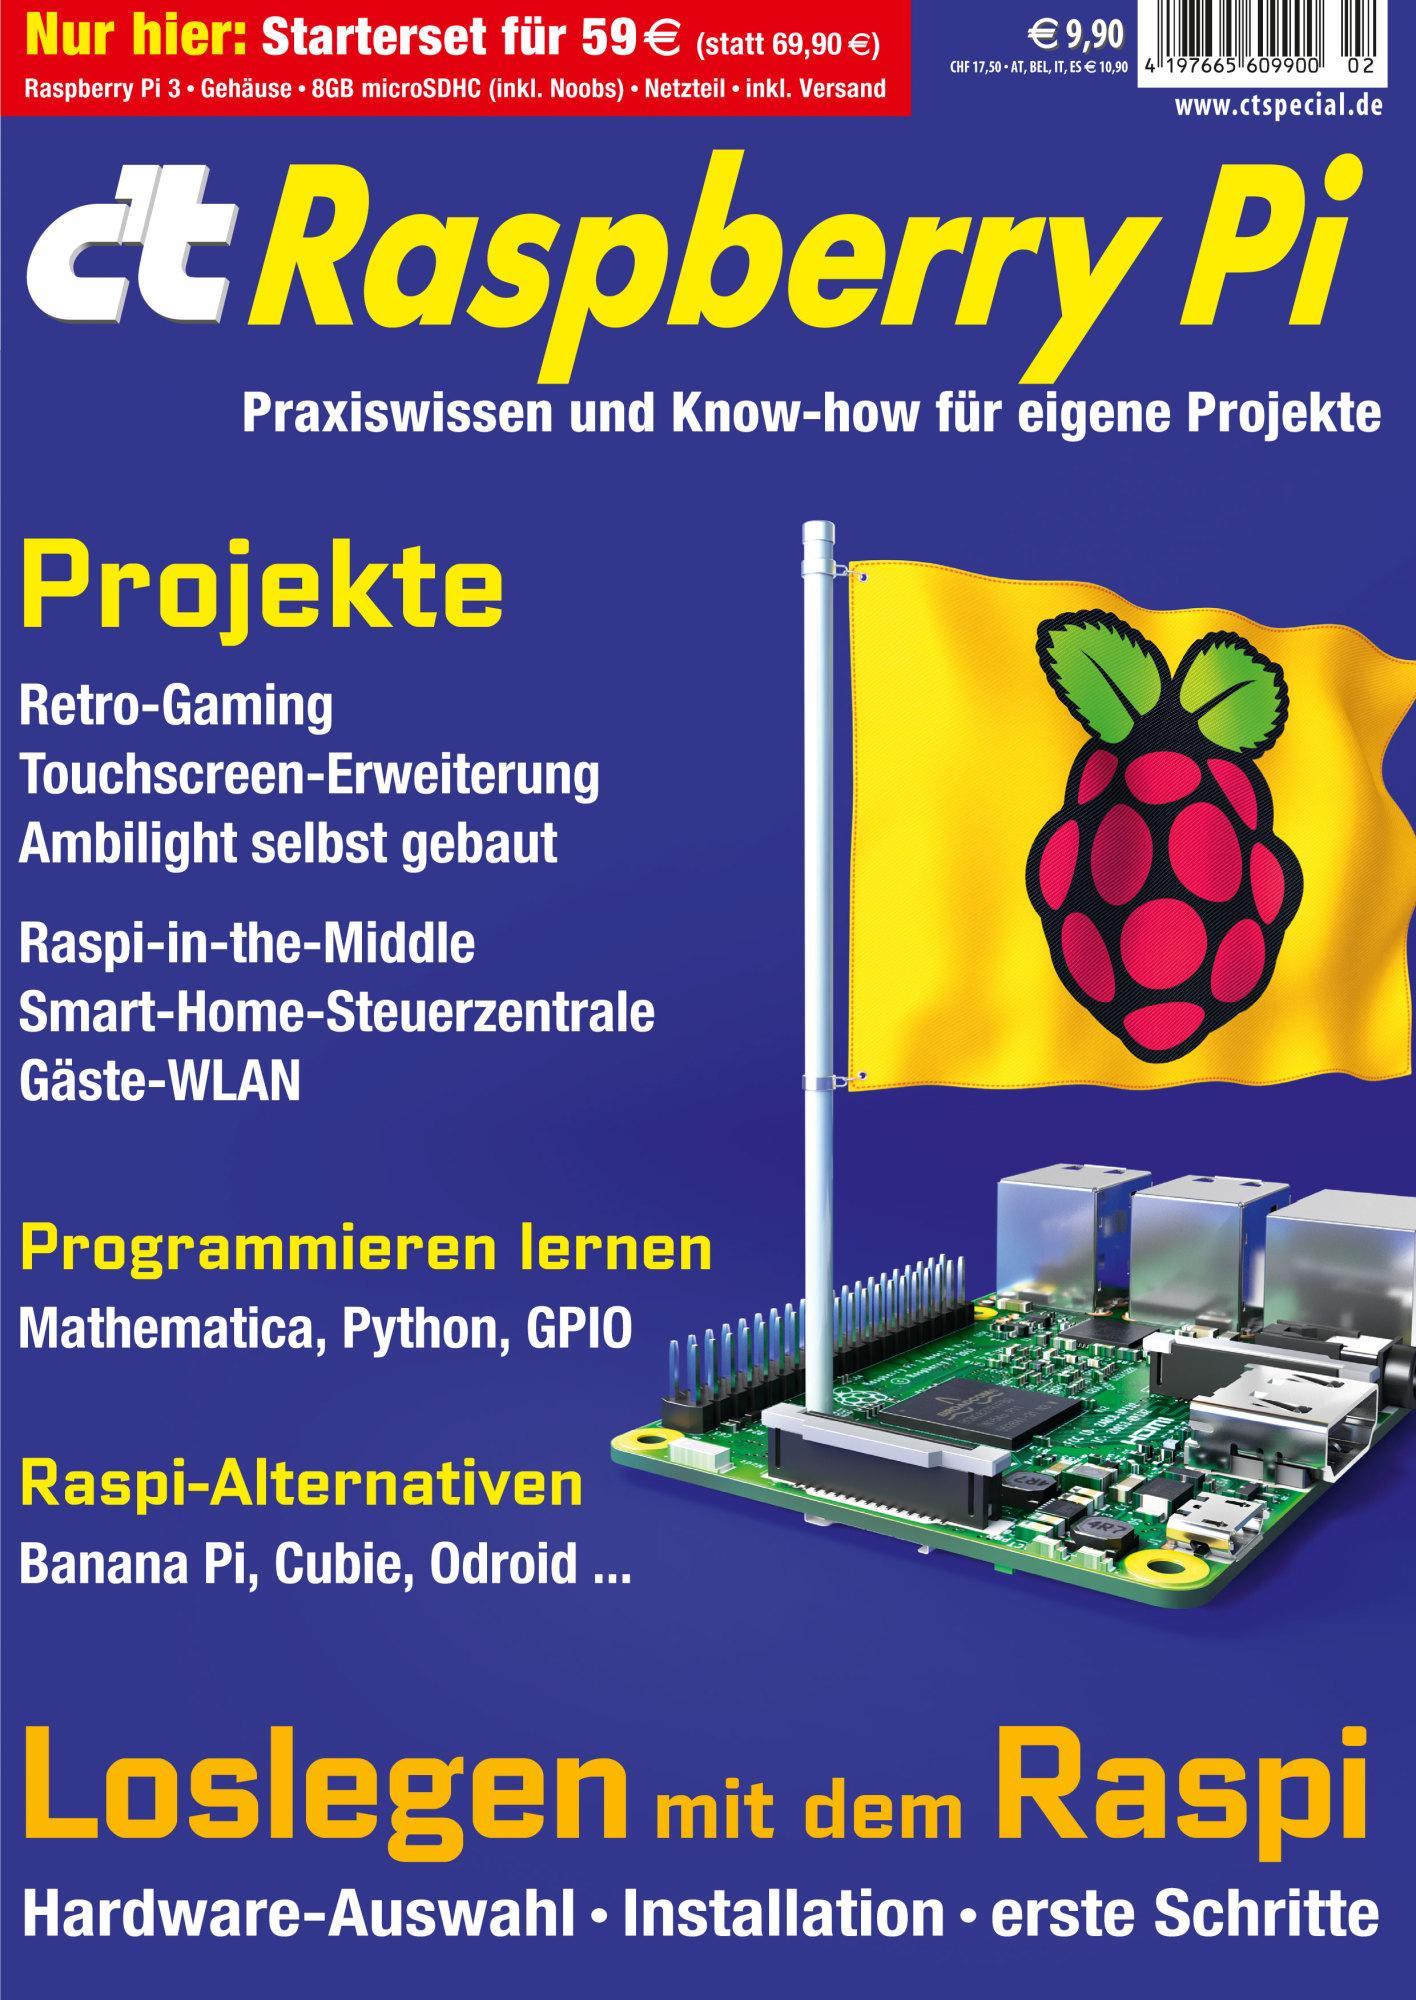 c't Raspberry Starterset-Angebot im Handel